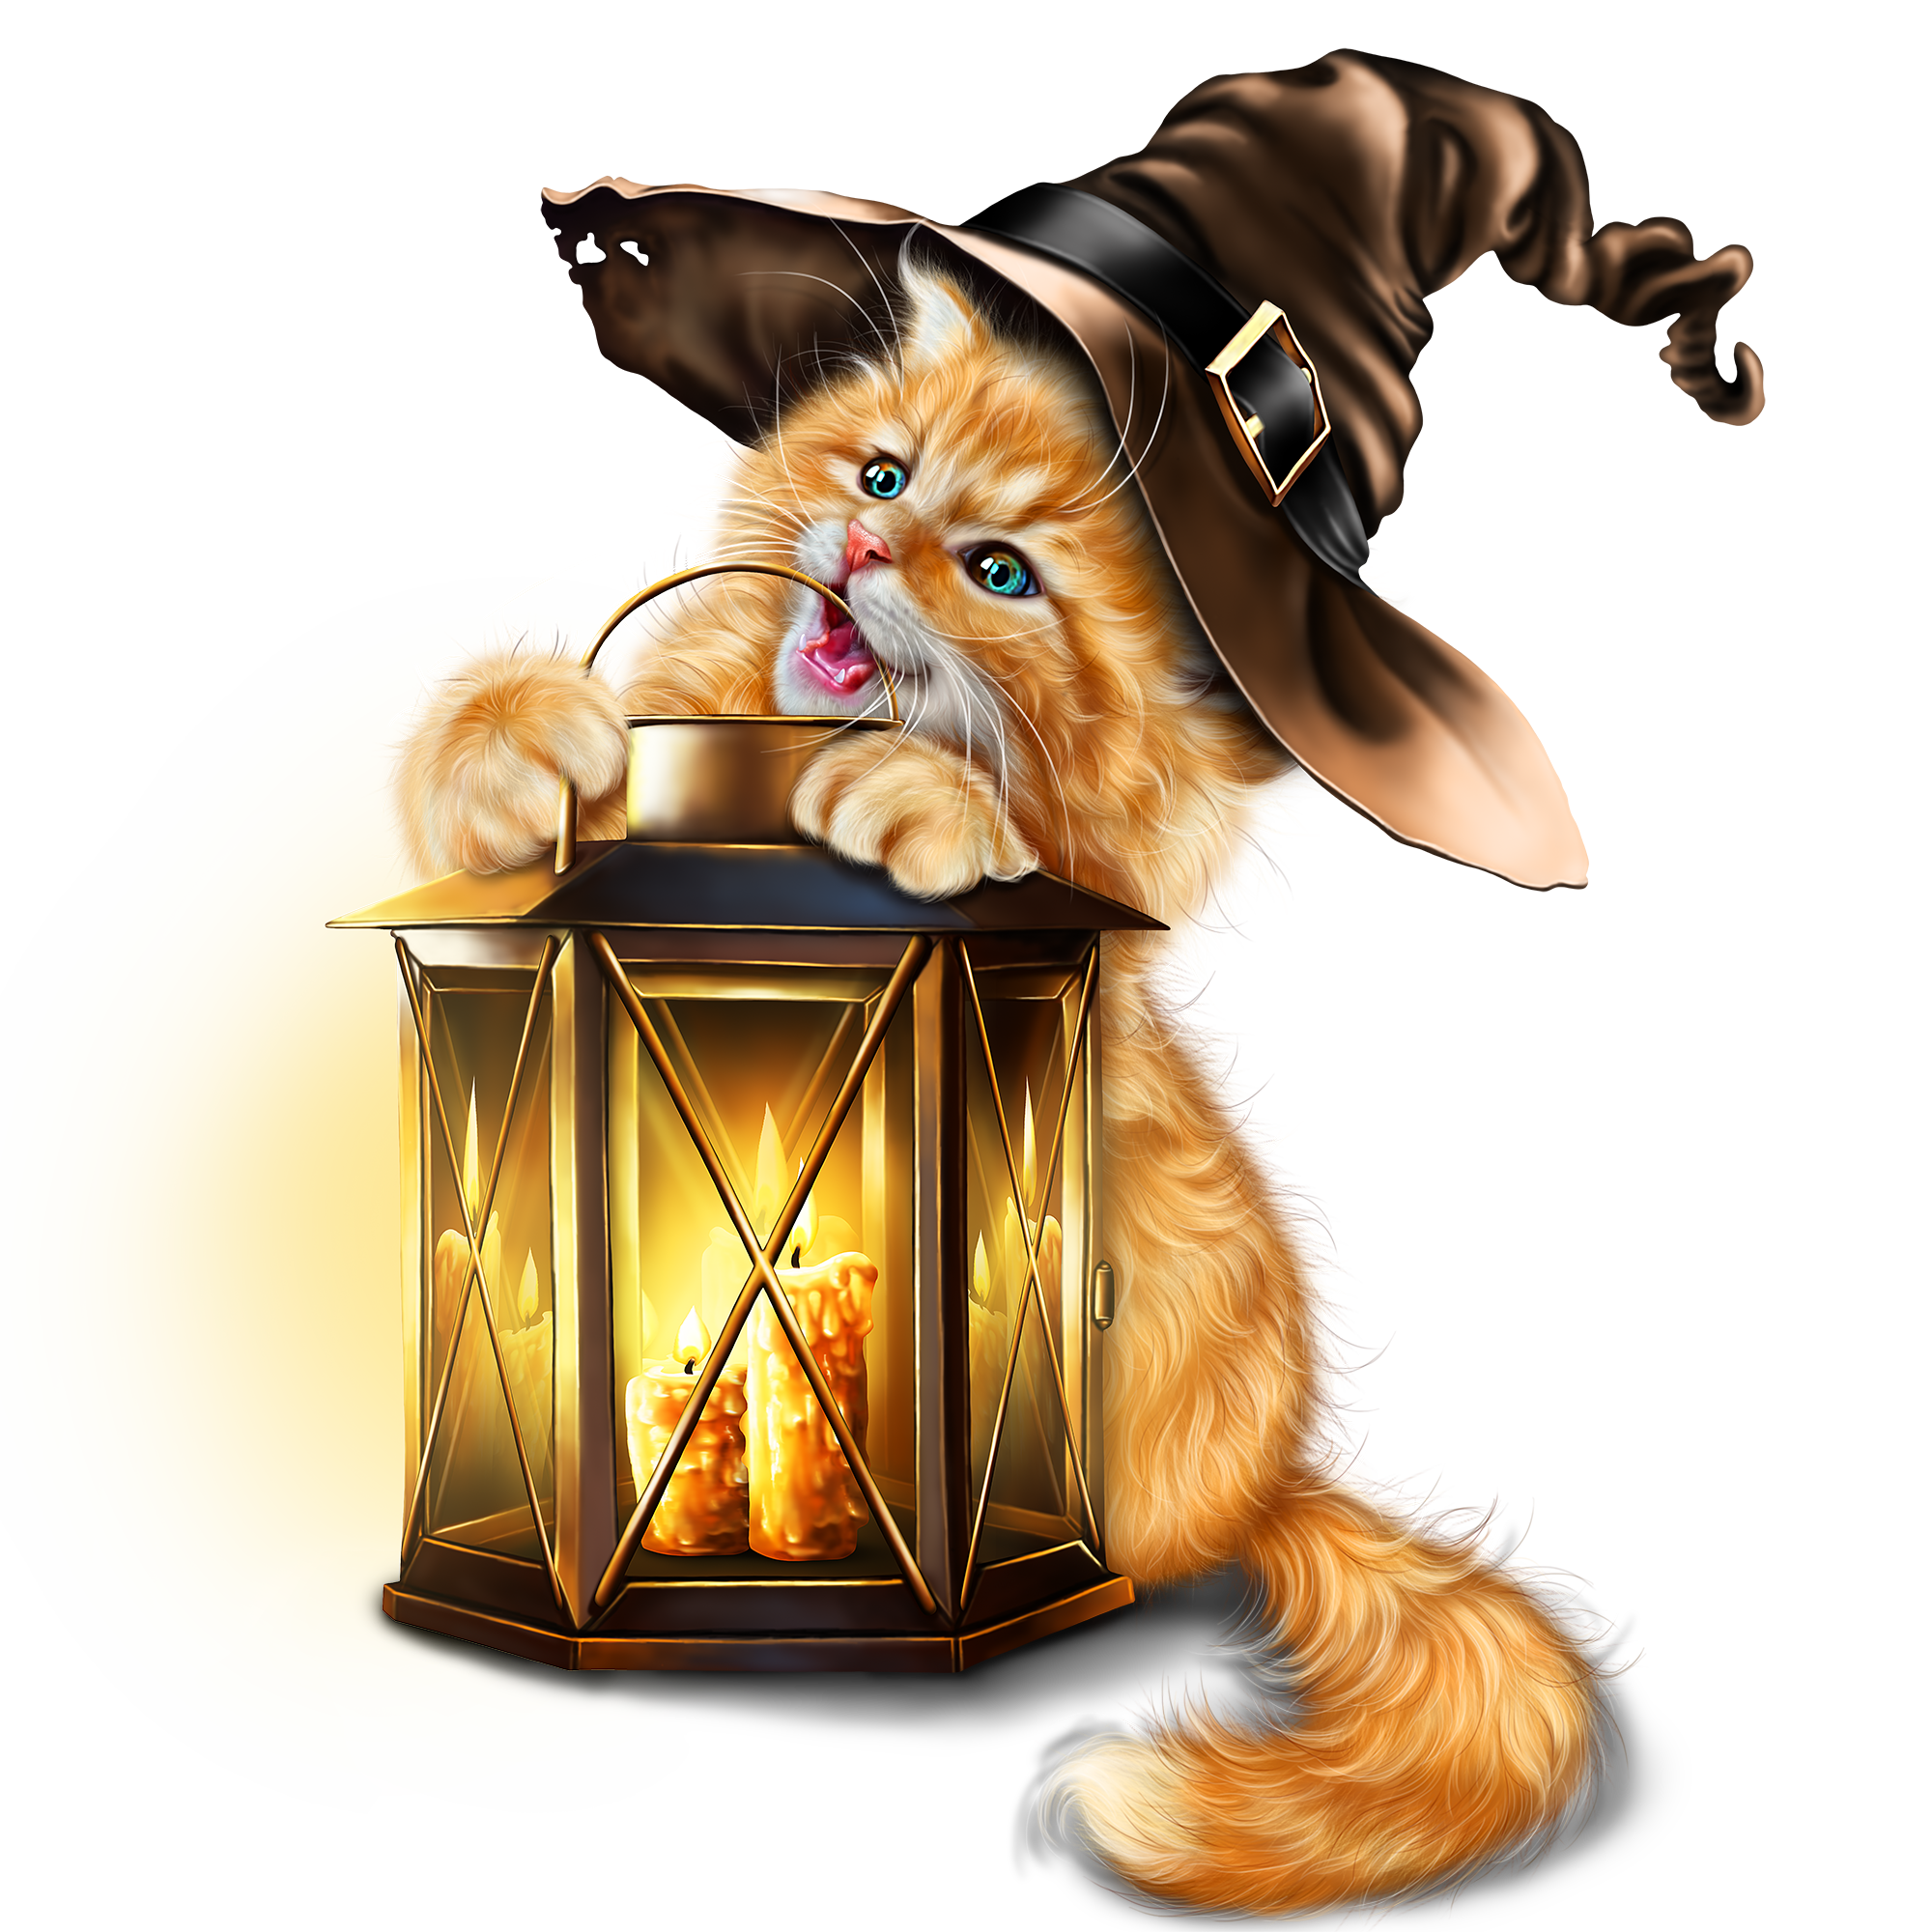 Pin By Cheryl Smyth On Kociaczki Cat Art Cat Artwork Halloween Cat